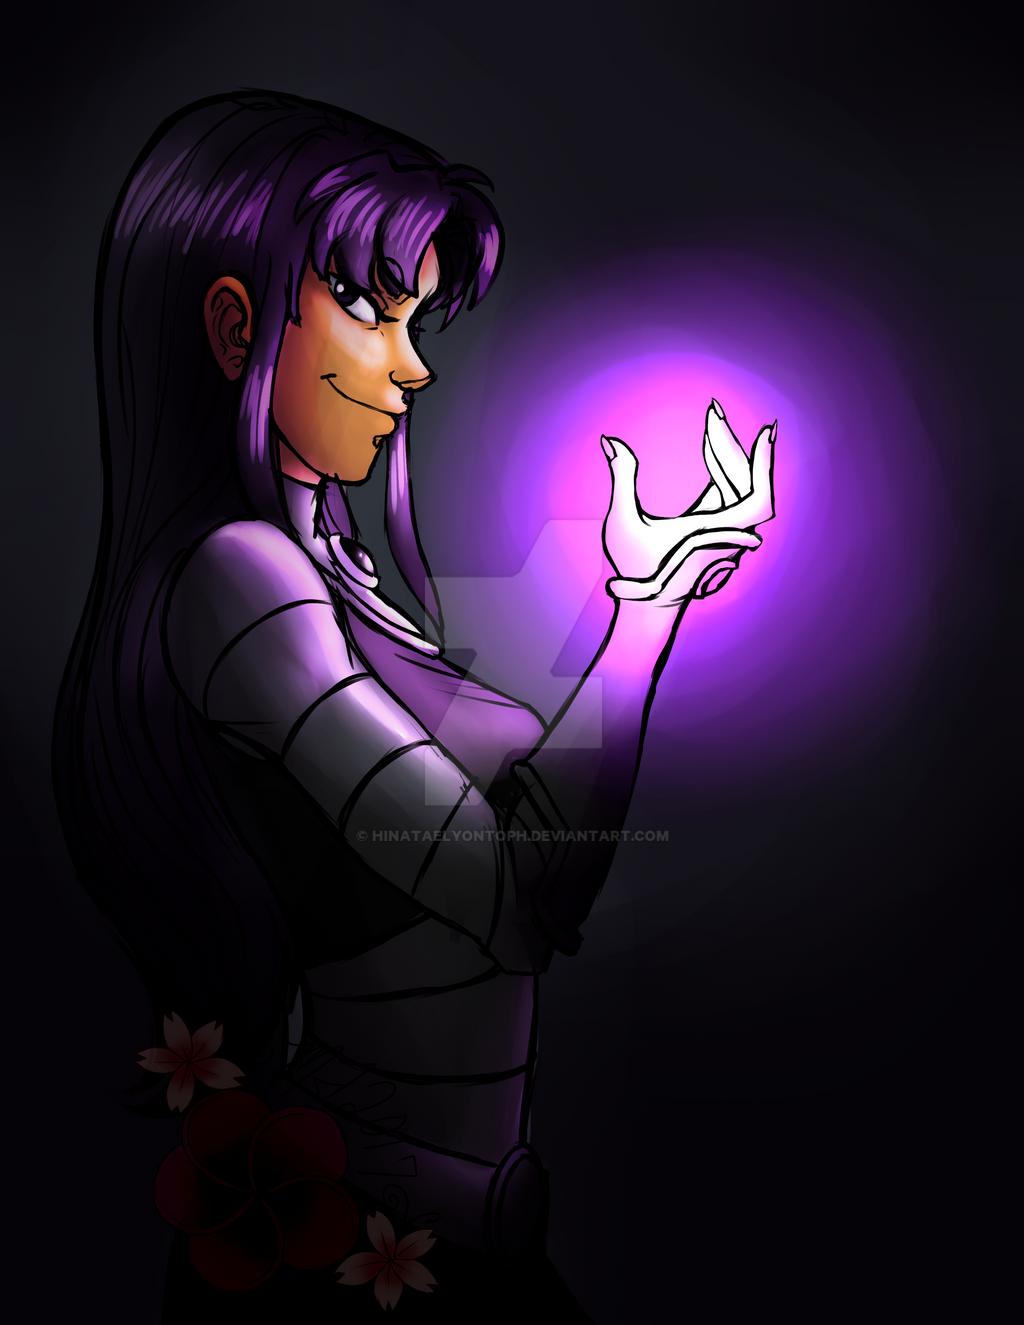 Teen Titans-Blackfire by HinataElyonToph on DeviantArt